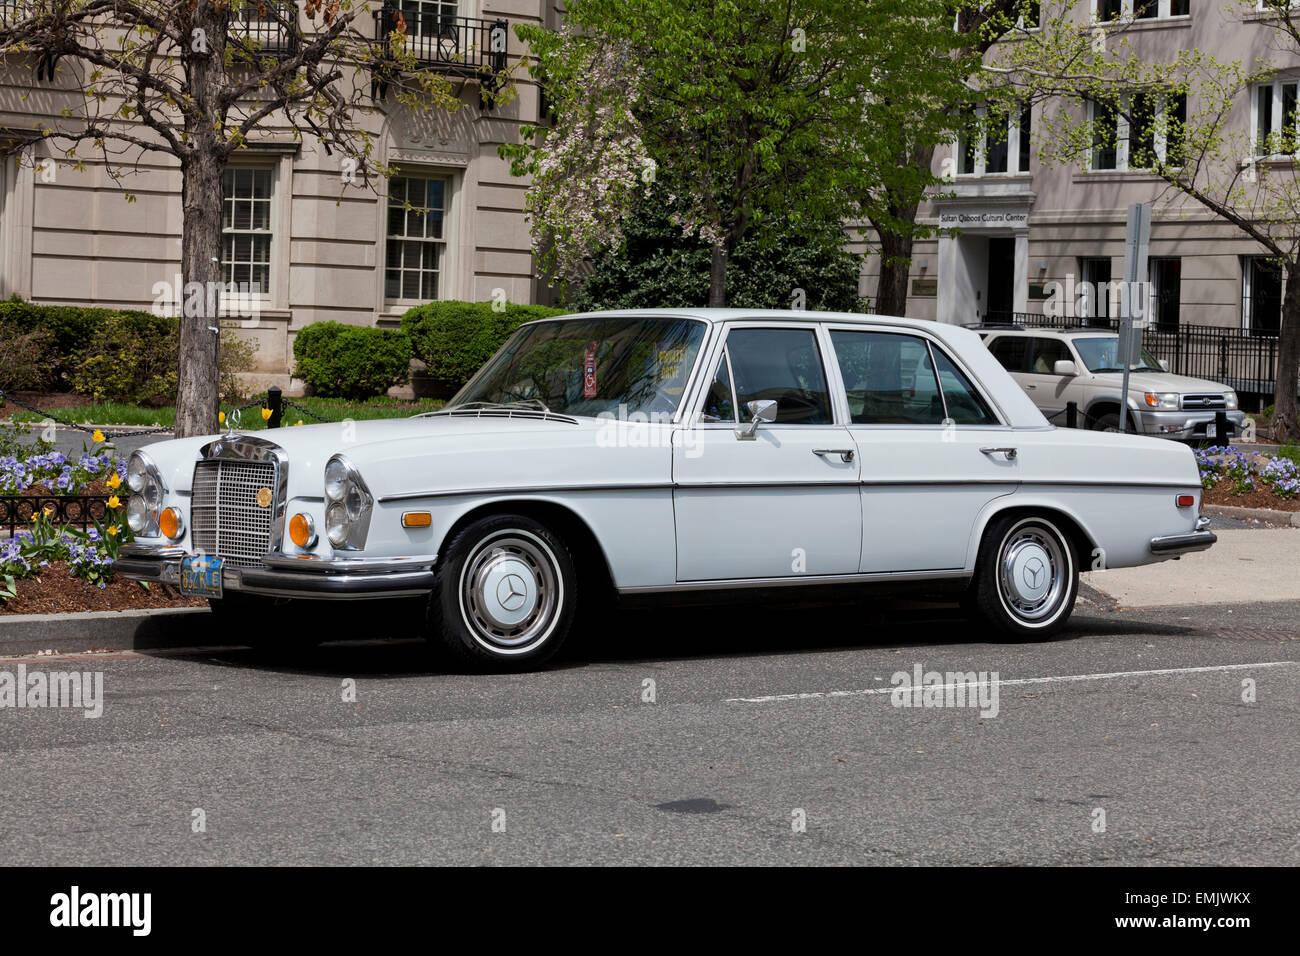 1970 Mercedes Benz 280S W108 Limousine - USA - Stock Image